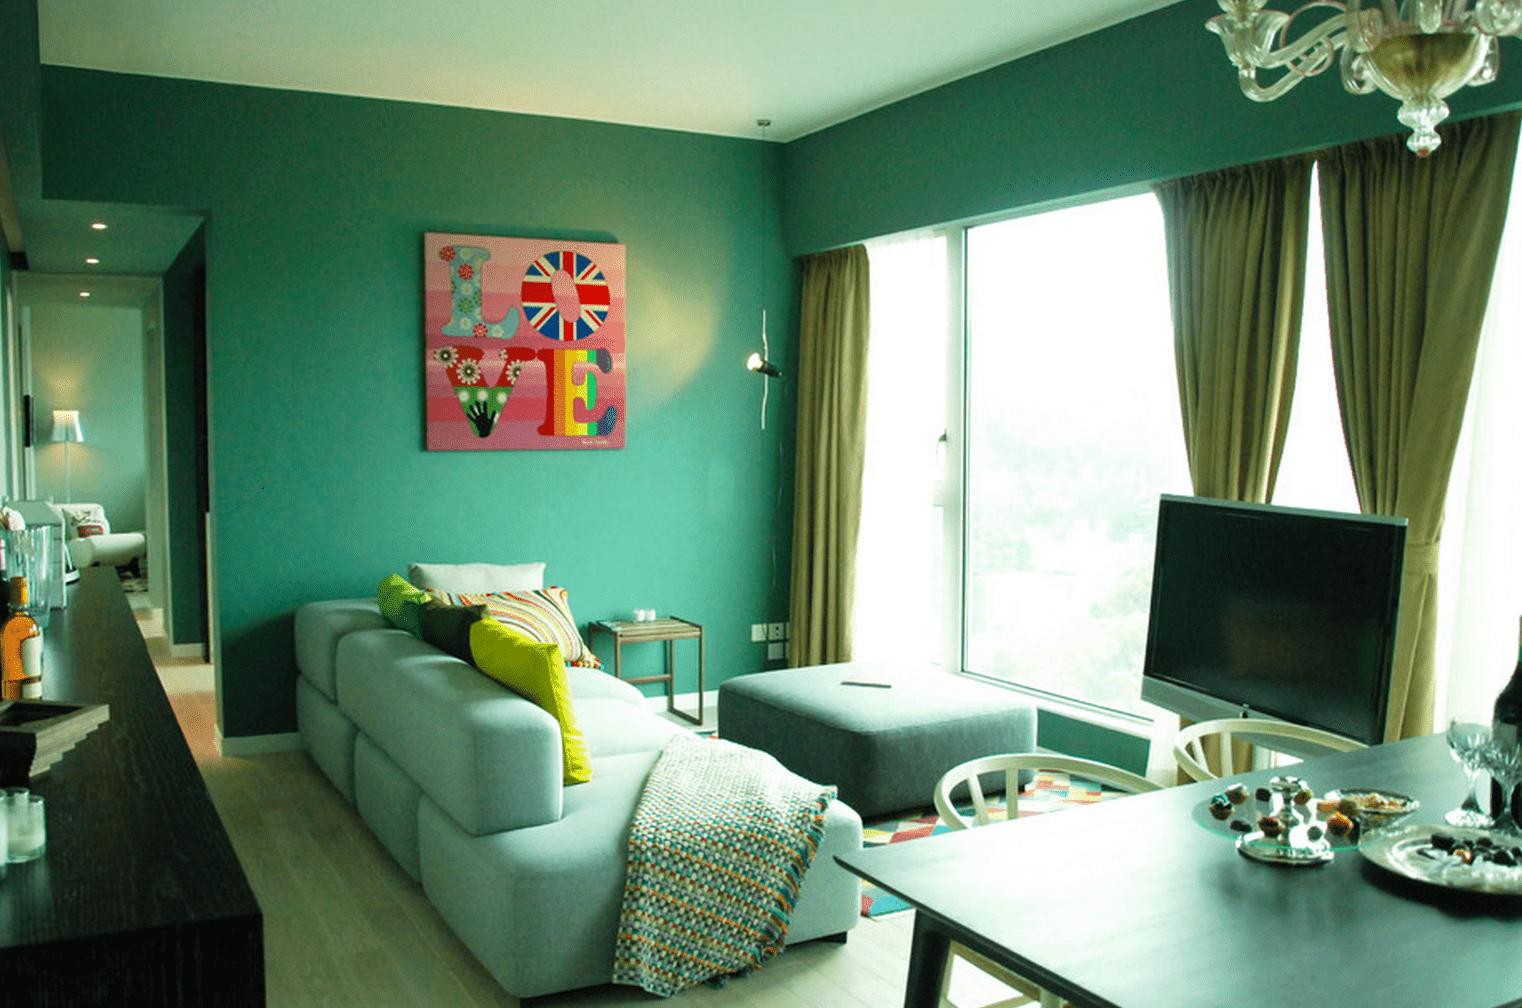 Living room green walls - Living Room Green Walls 30